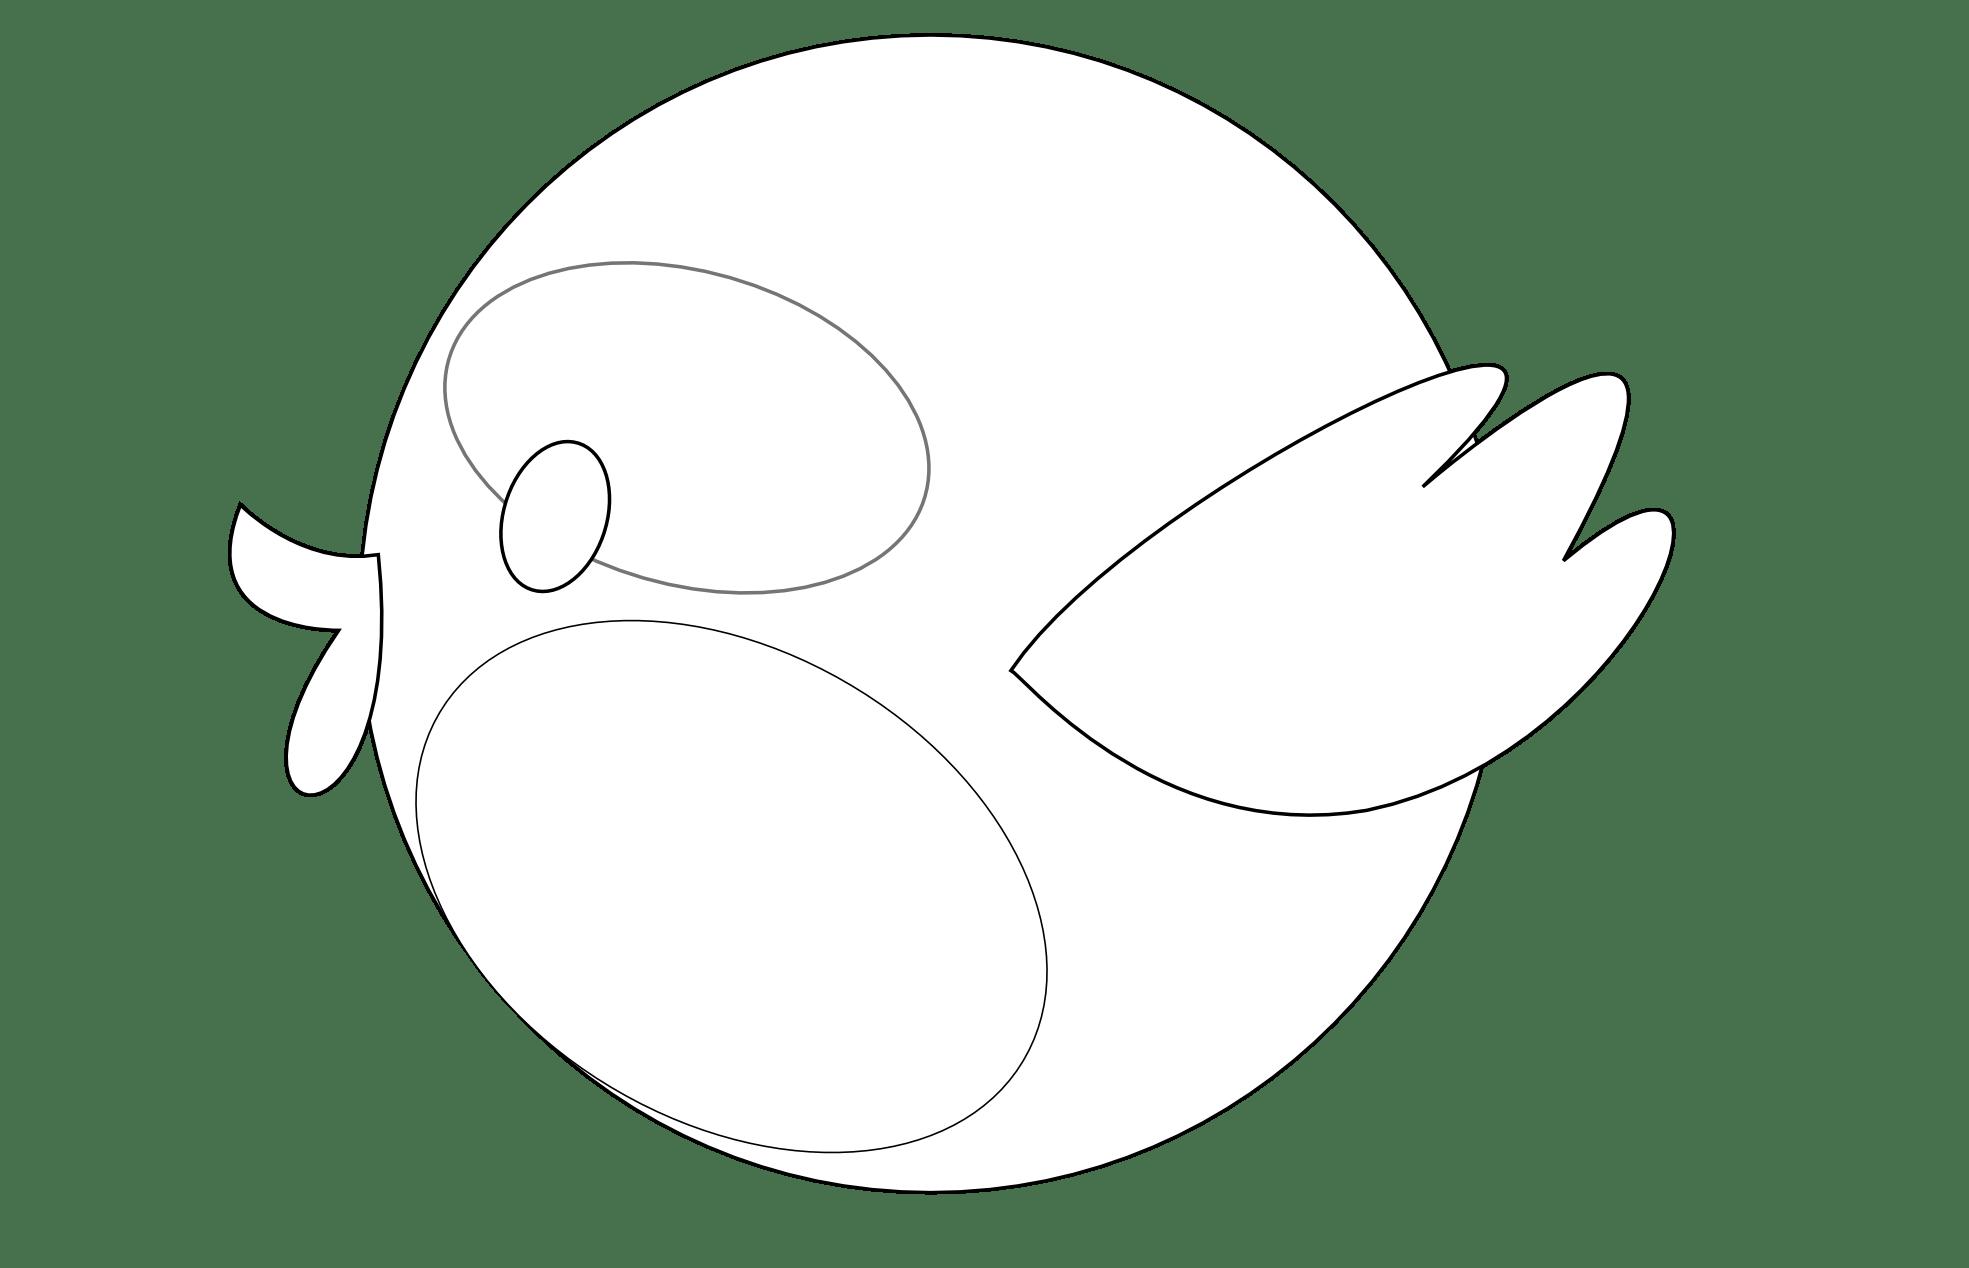 Bird Clipart Black And White Clipart Panda